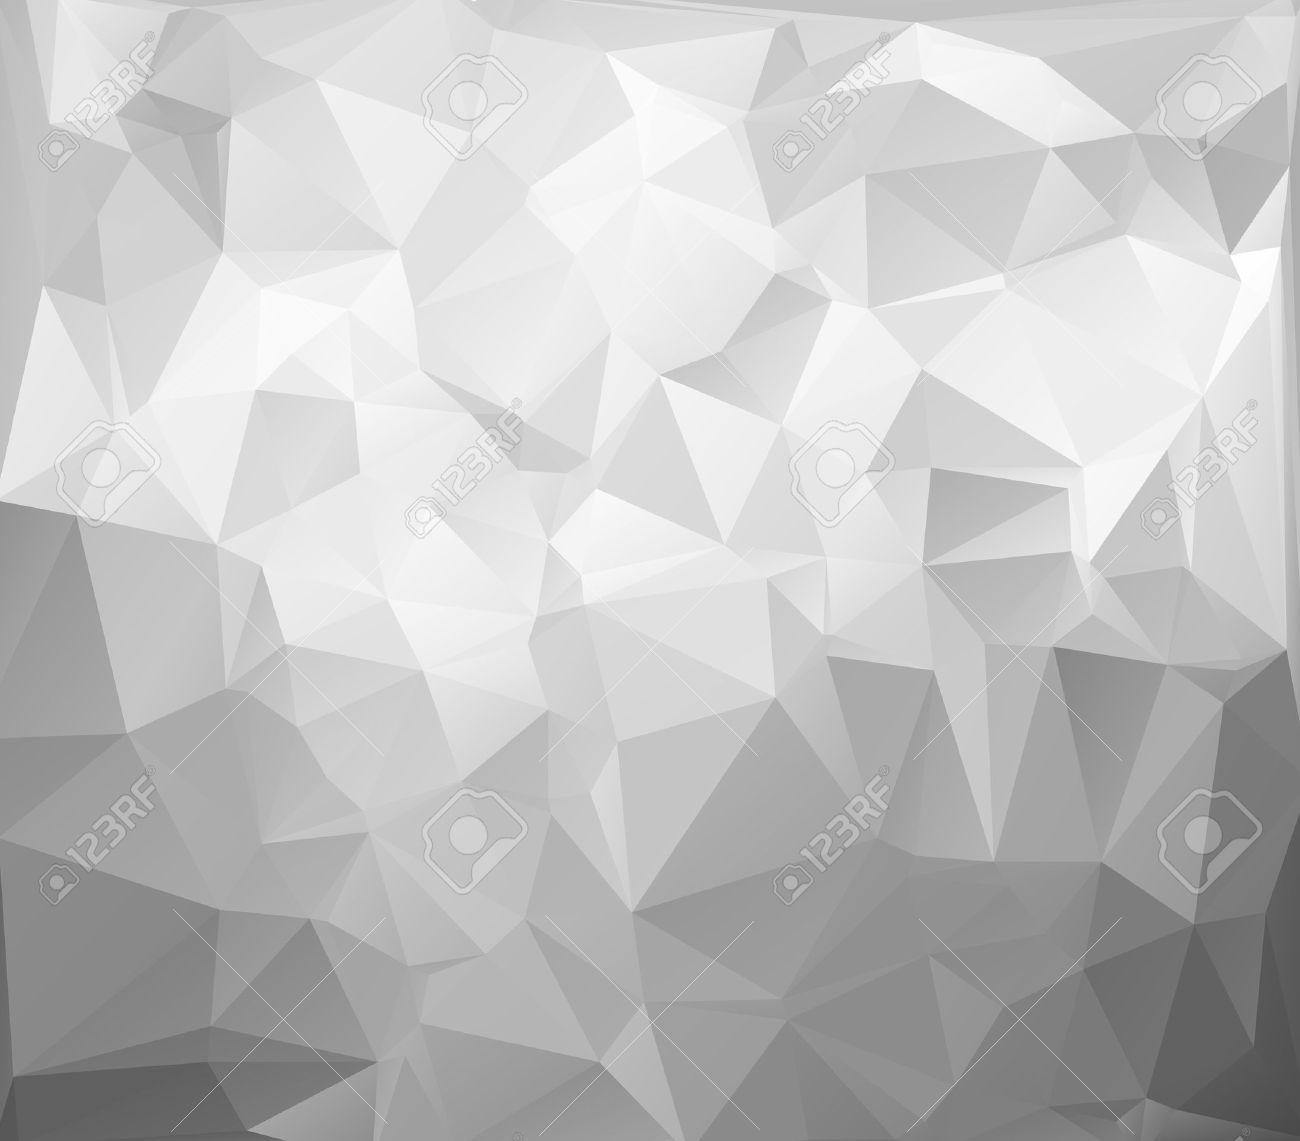 Grau, Weiß, Hell Polygonal Mosaik Hintergrund, Vektor-Illustration ...